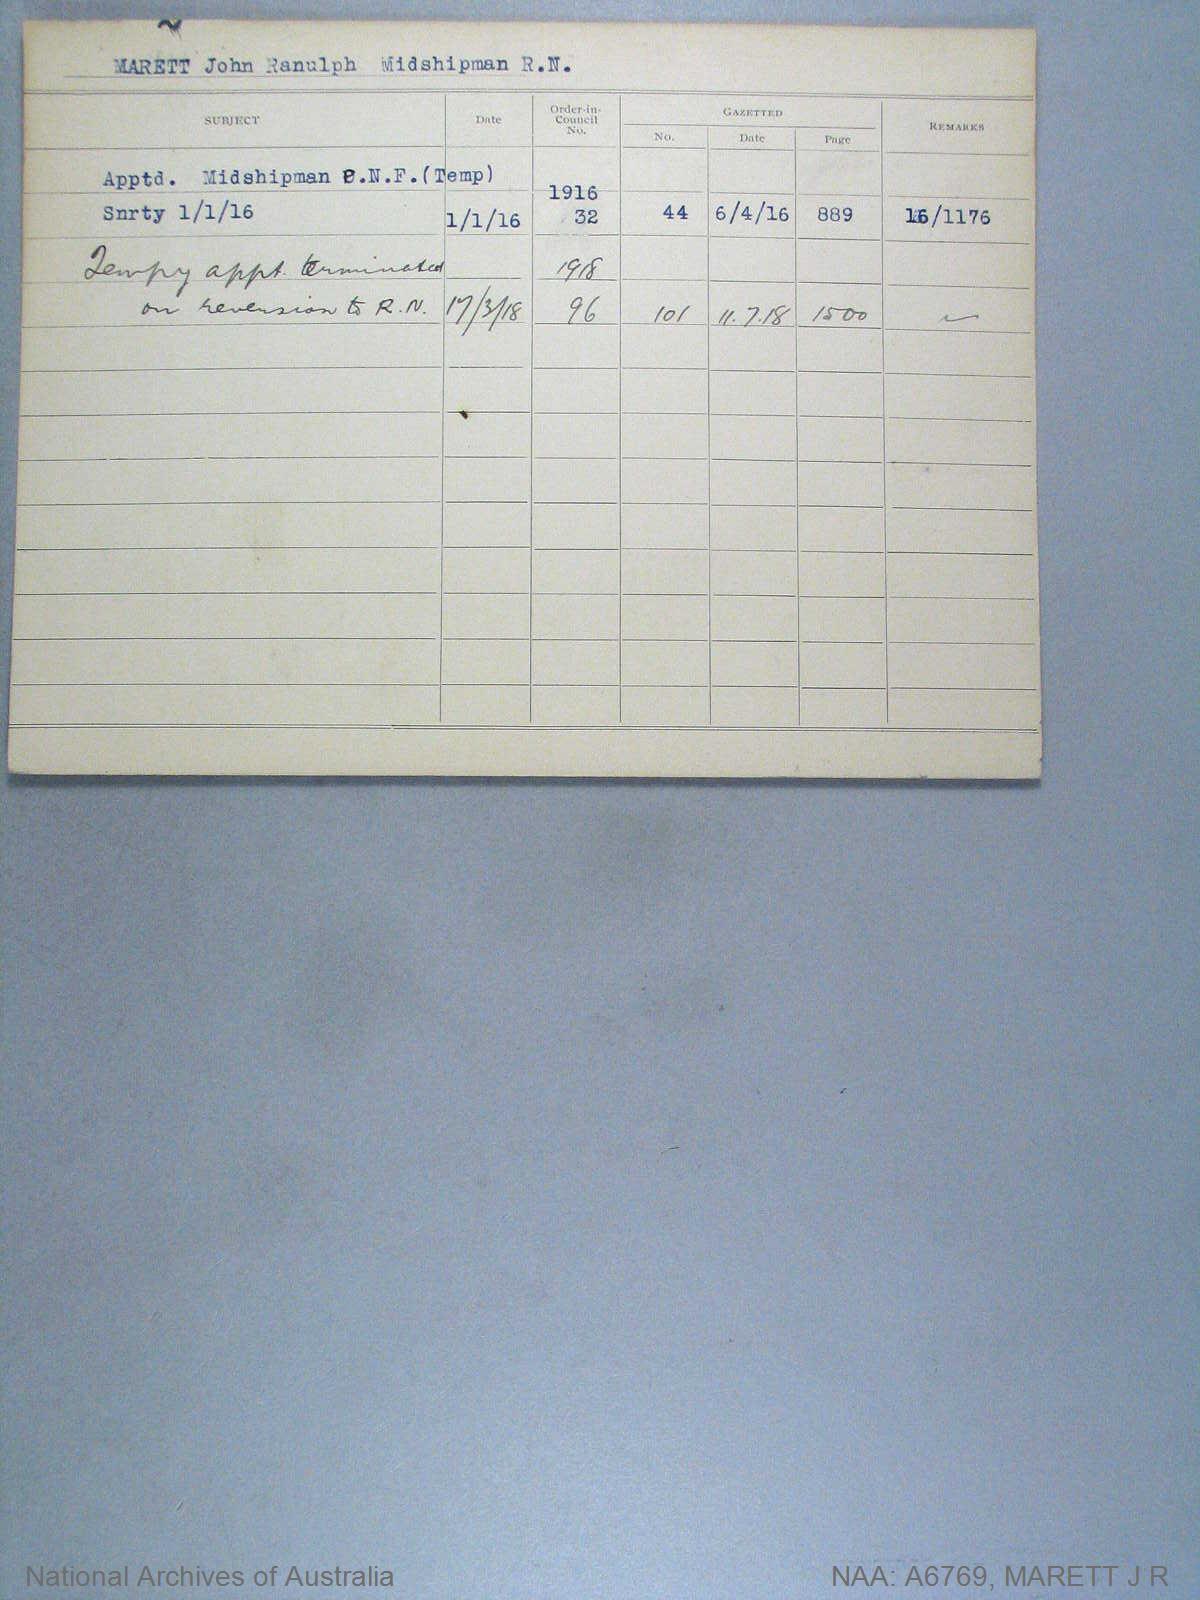 MARETT JOHN RANULPH : Date of birth - 23 Jan 1900 : Place of birth - OXFORD : Place of enlistment - Unknown : Next of Kin - MARETT R